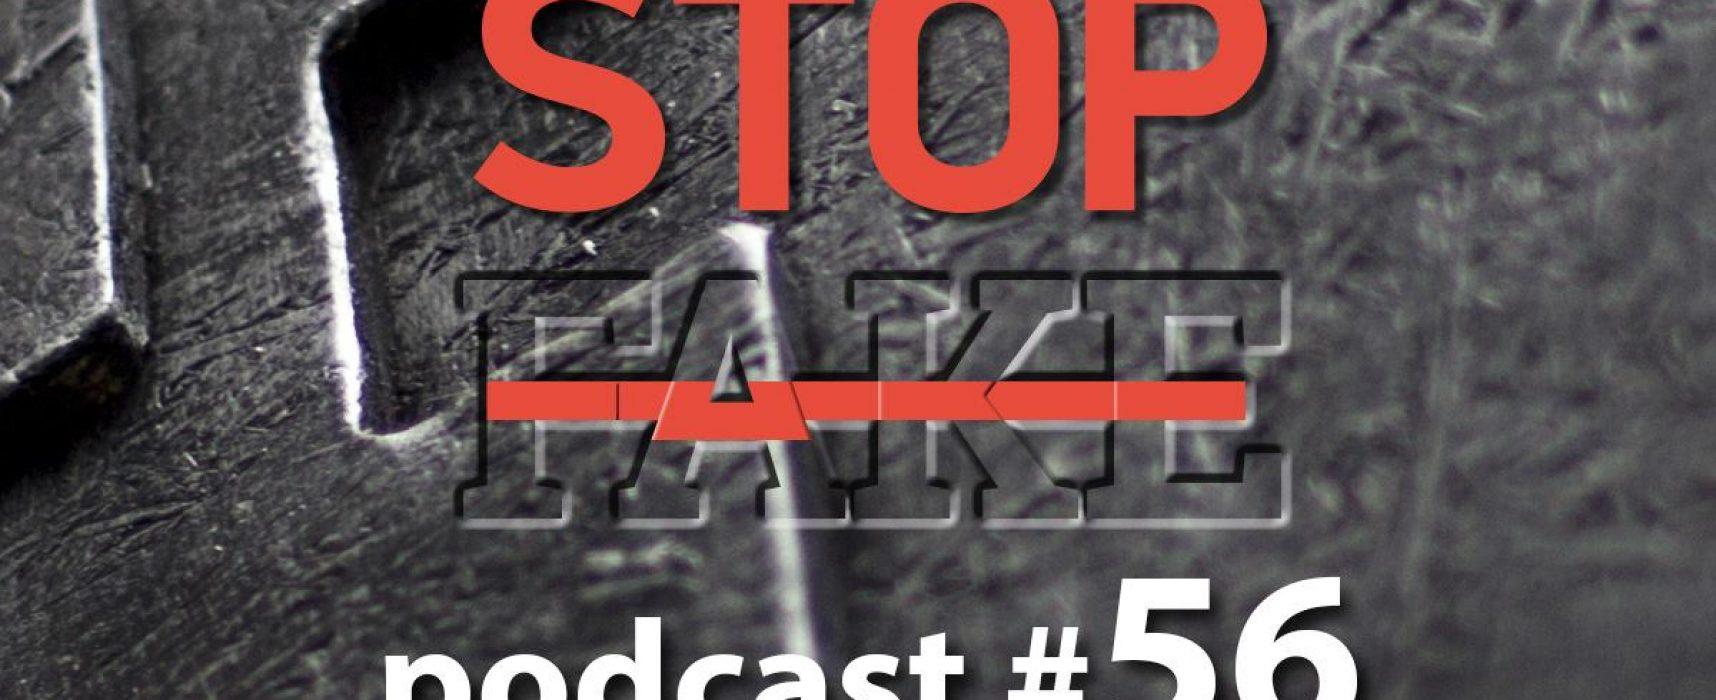 StopFake podcast #56